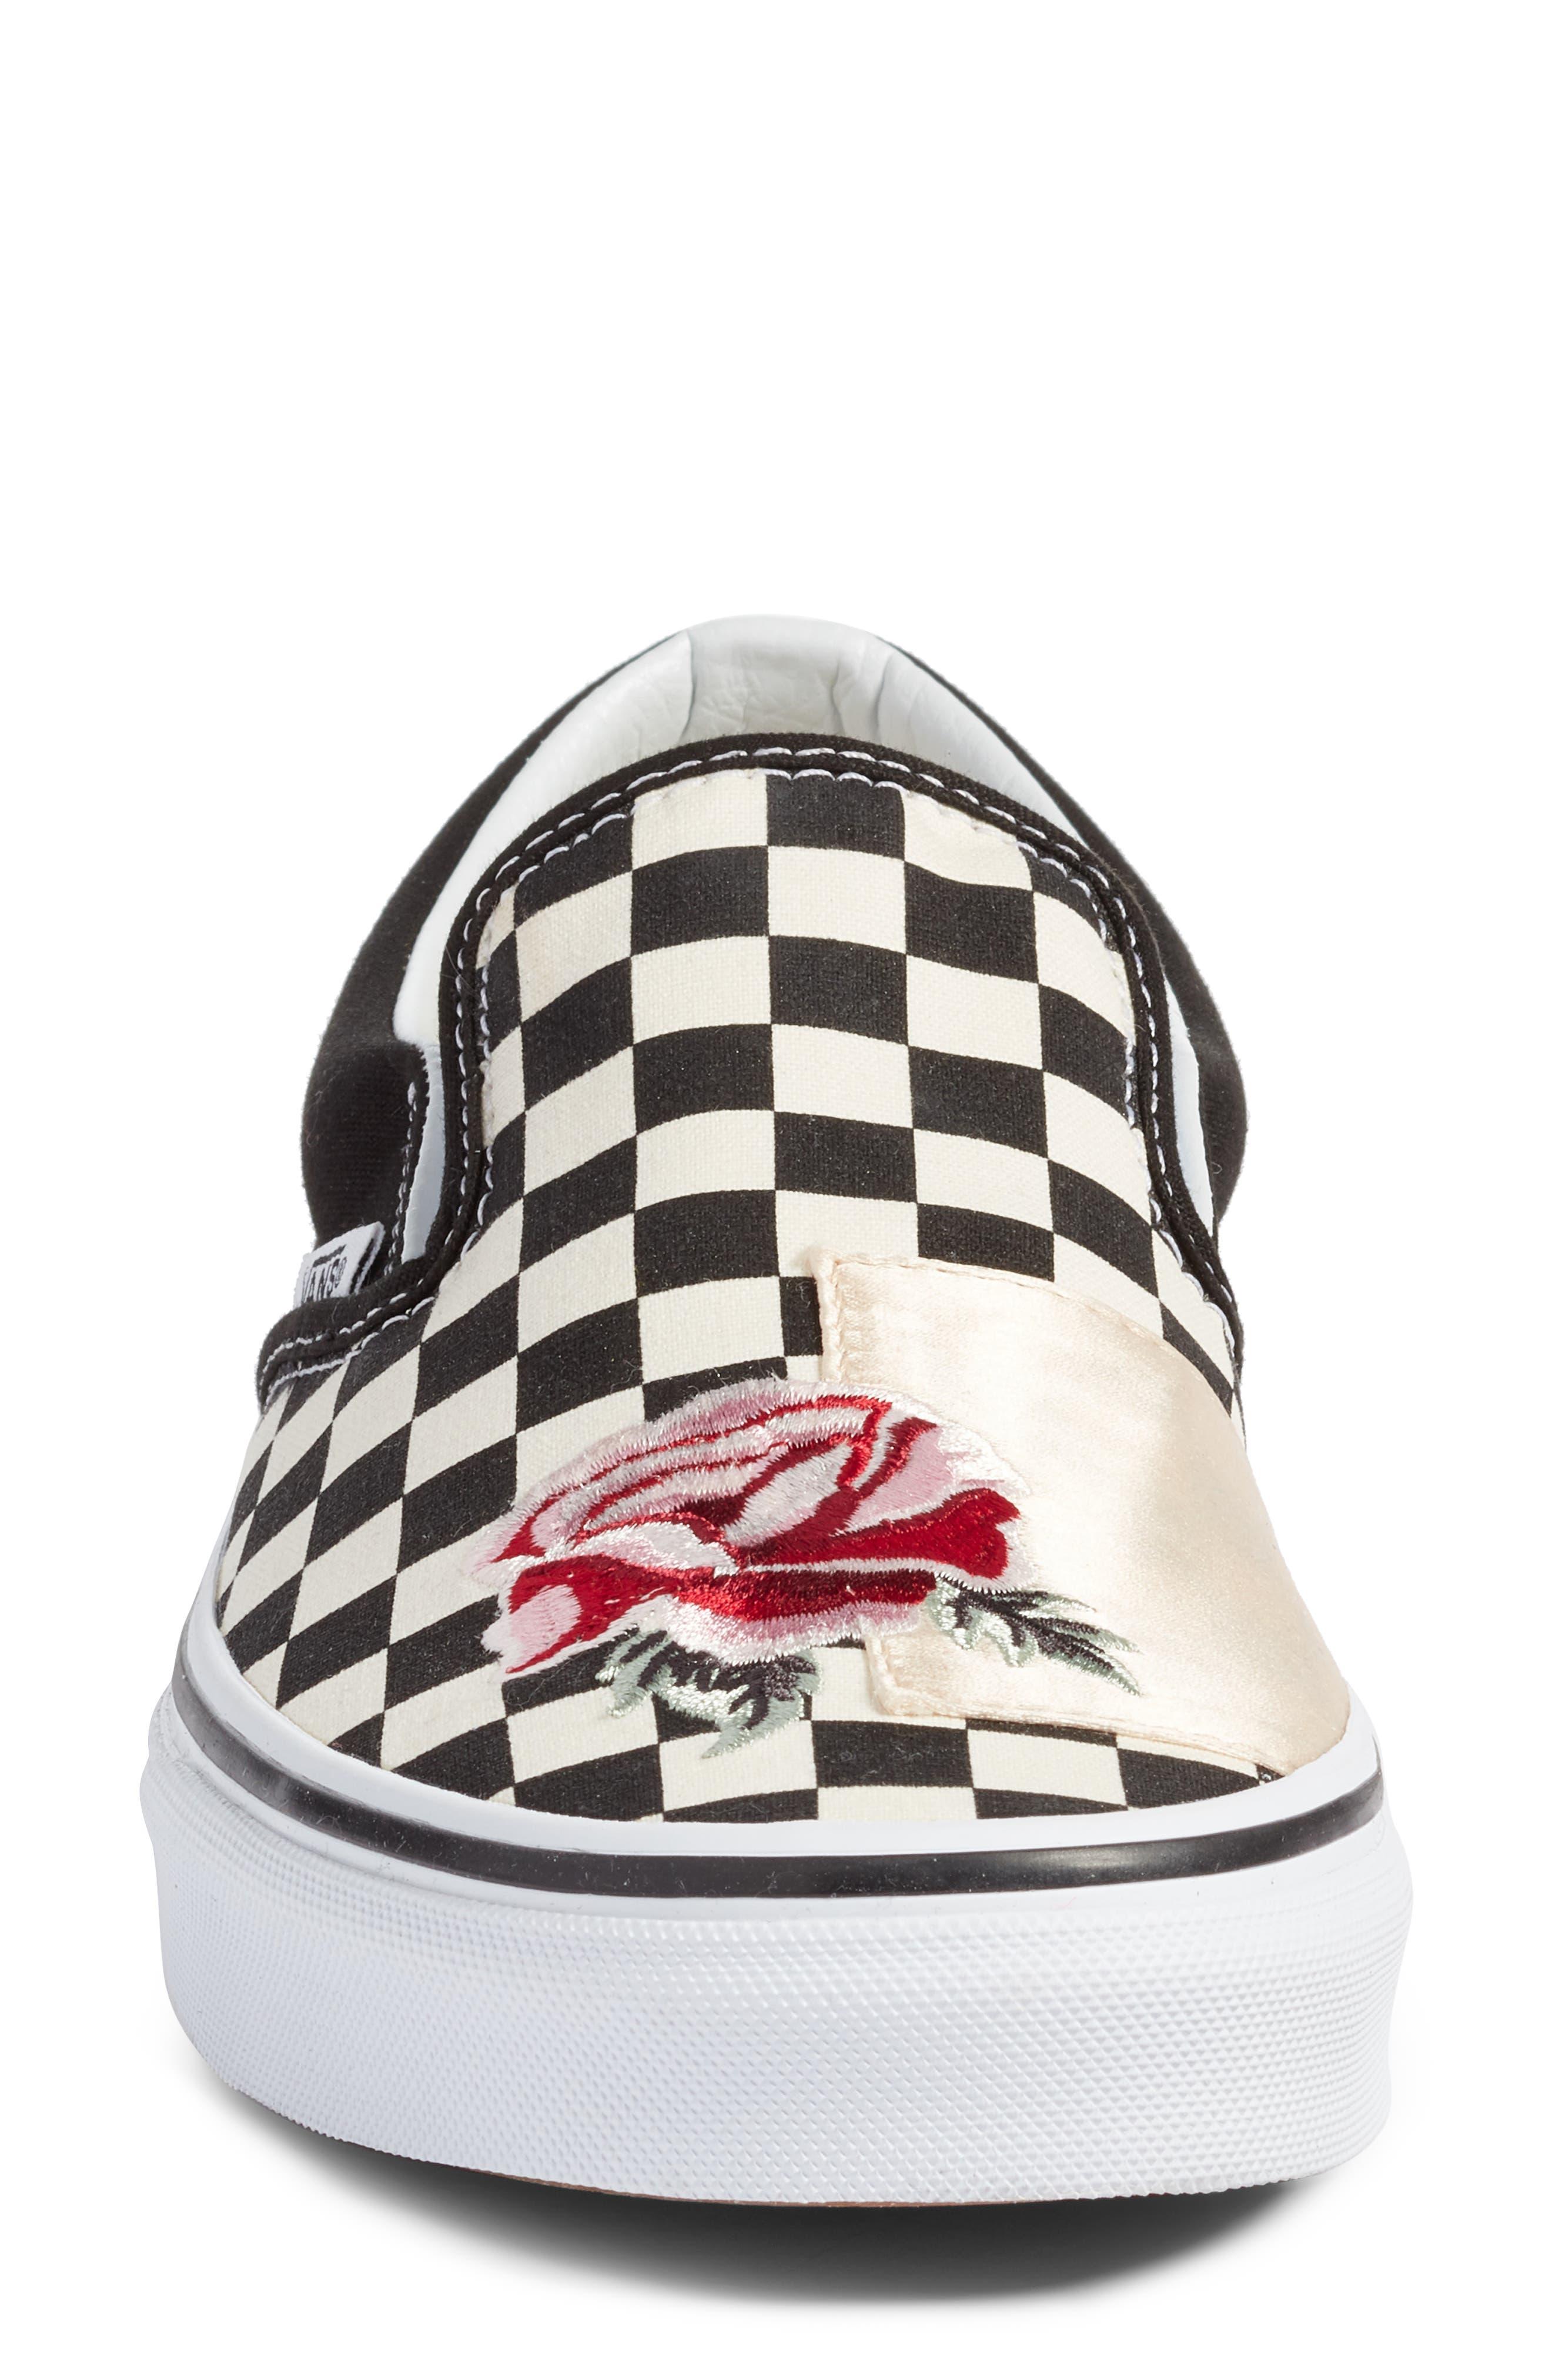 UA Classic Slip-On Sneaker,                             Alternate thumbnail 4, color,                             001